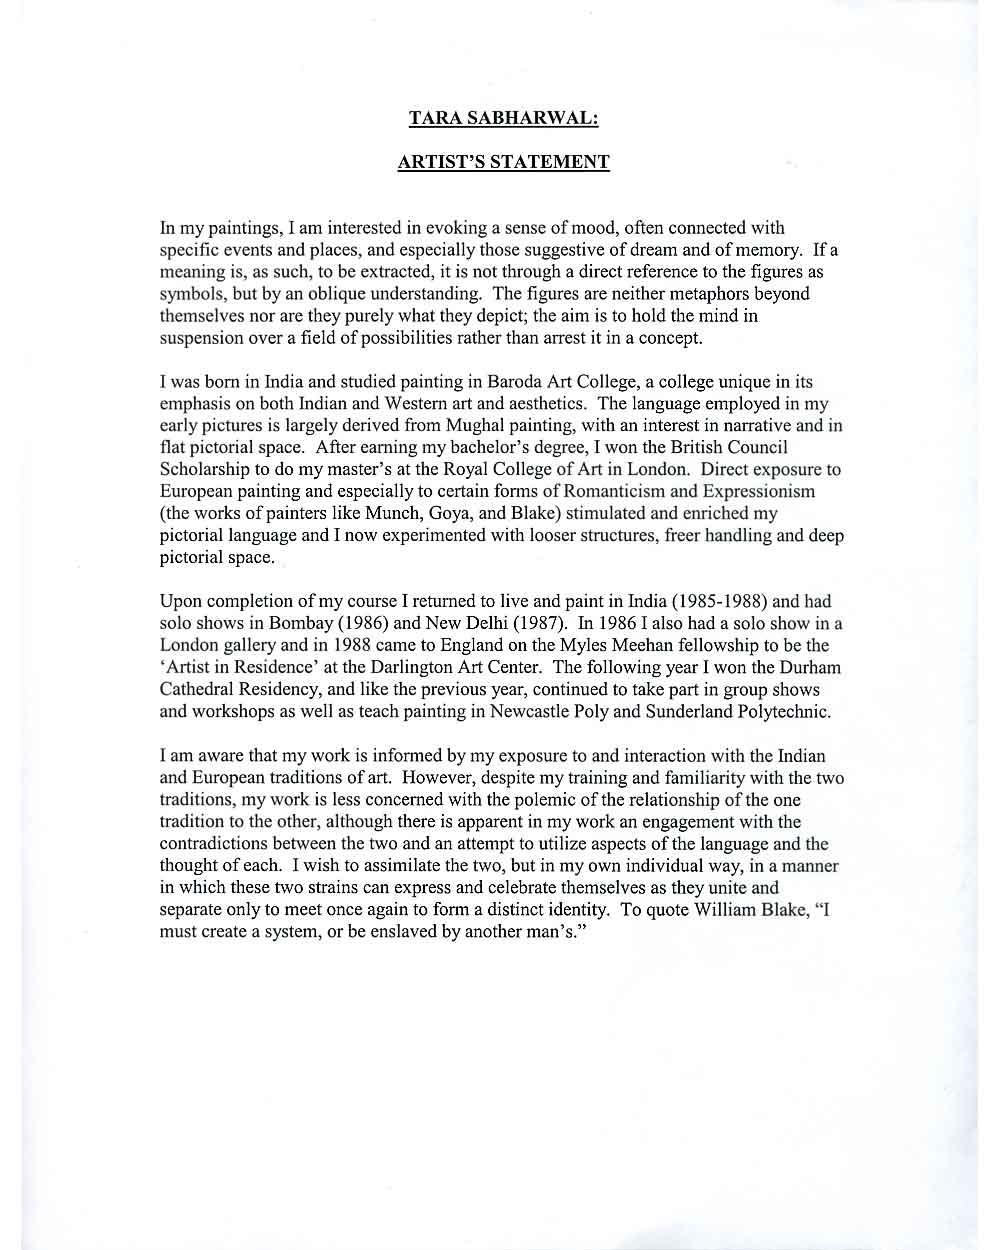 Tara Sabharwal's artist's statement, pg 1